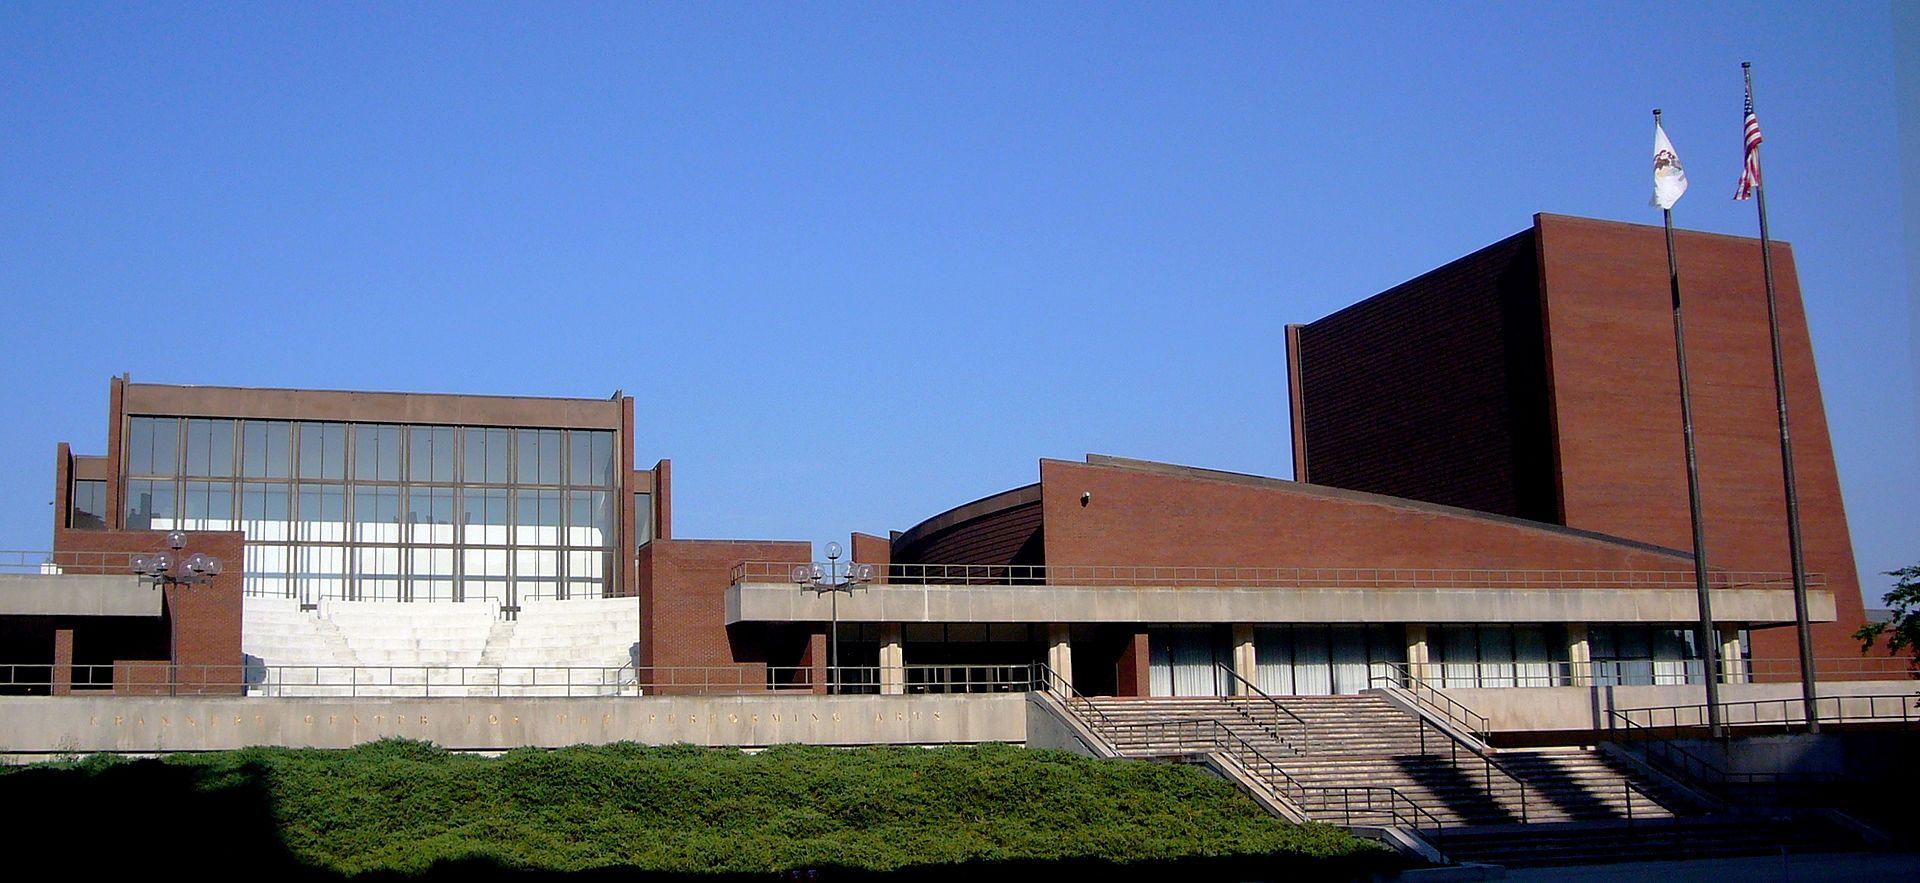 Purdue University Design School